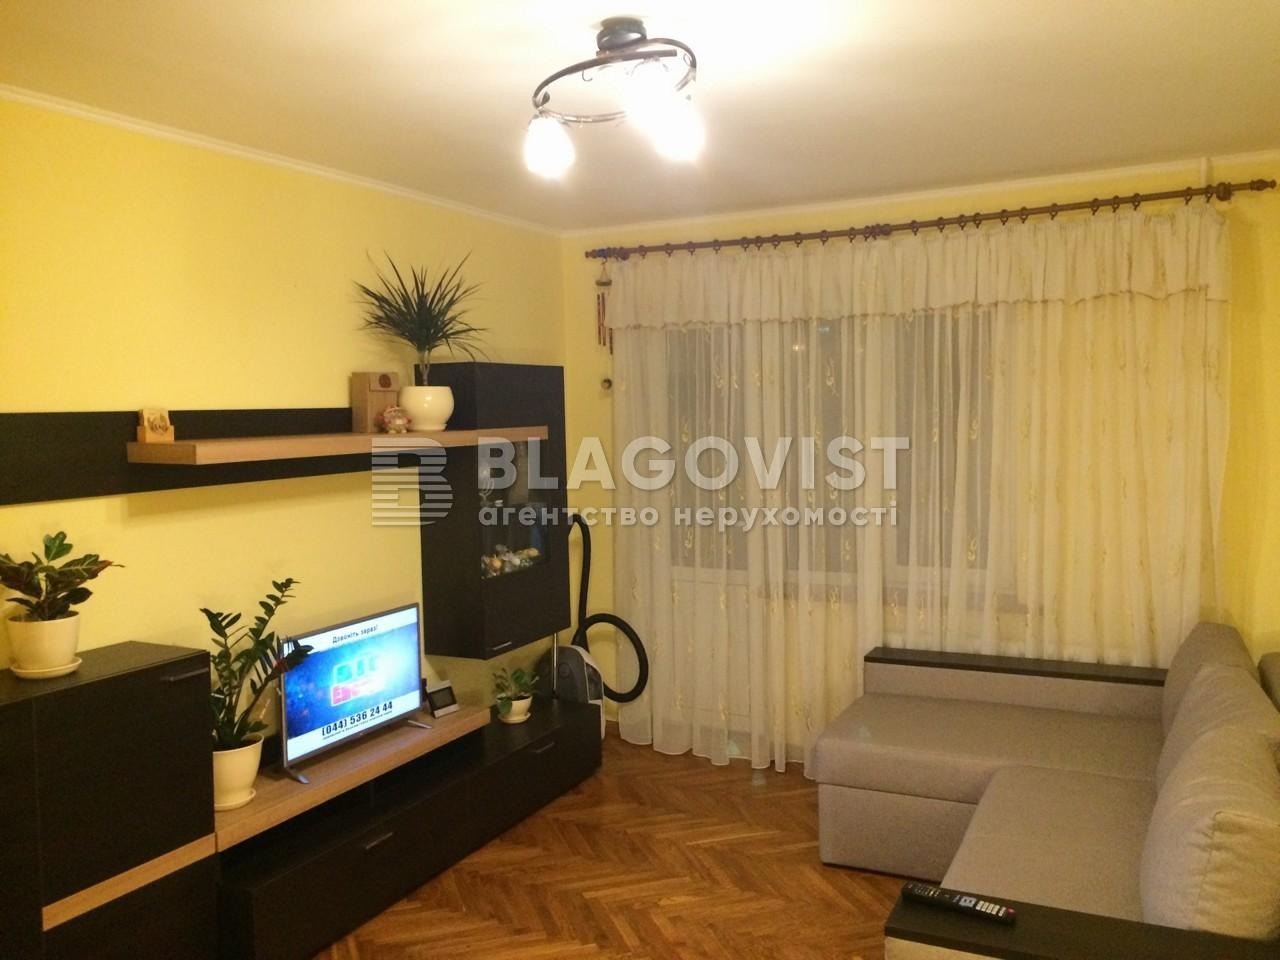 Квартира F-39217, Правды просп., 64, Киев - Фото 1